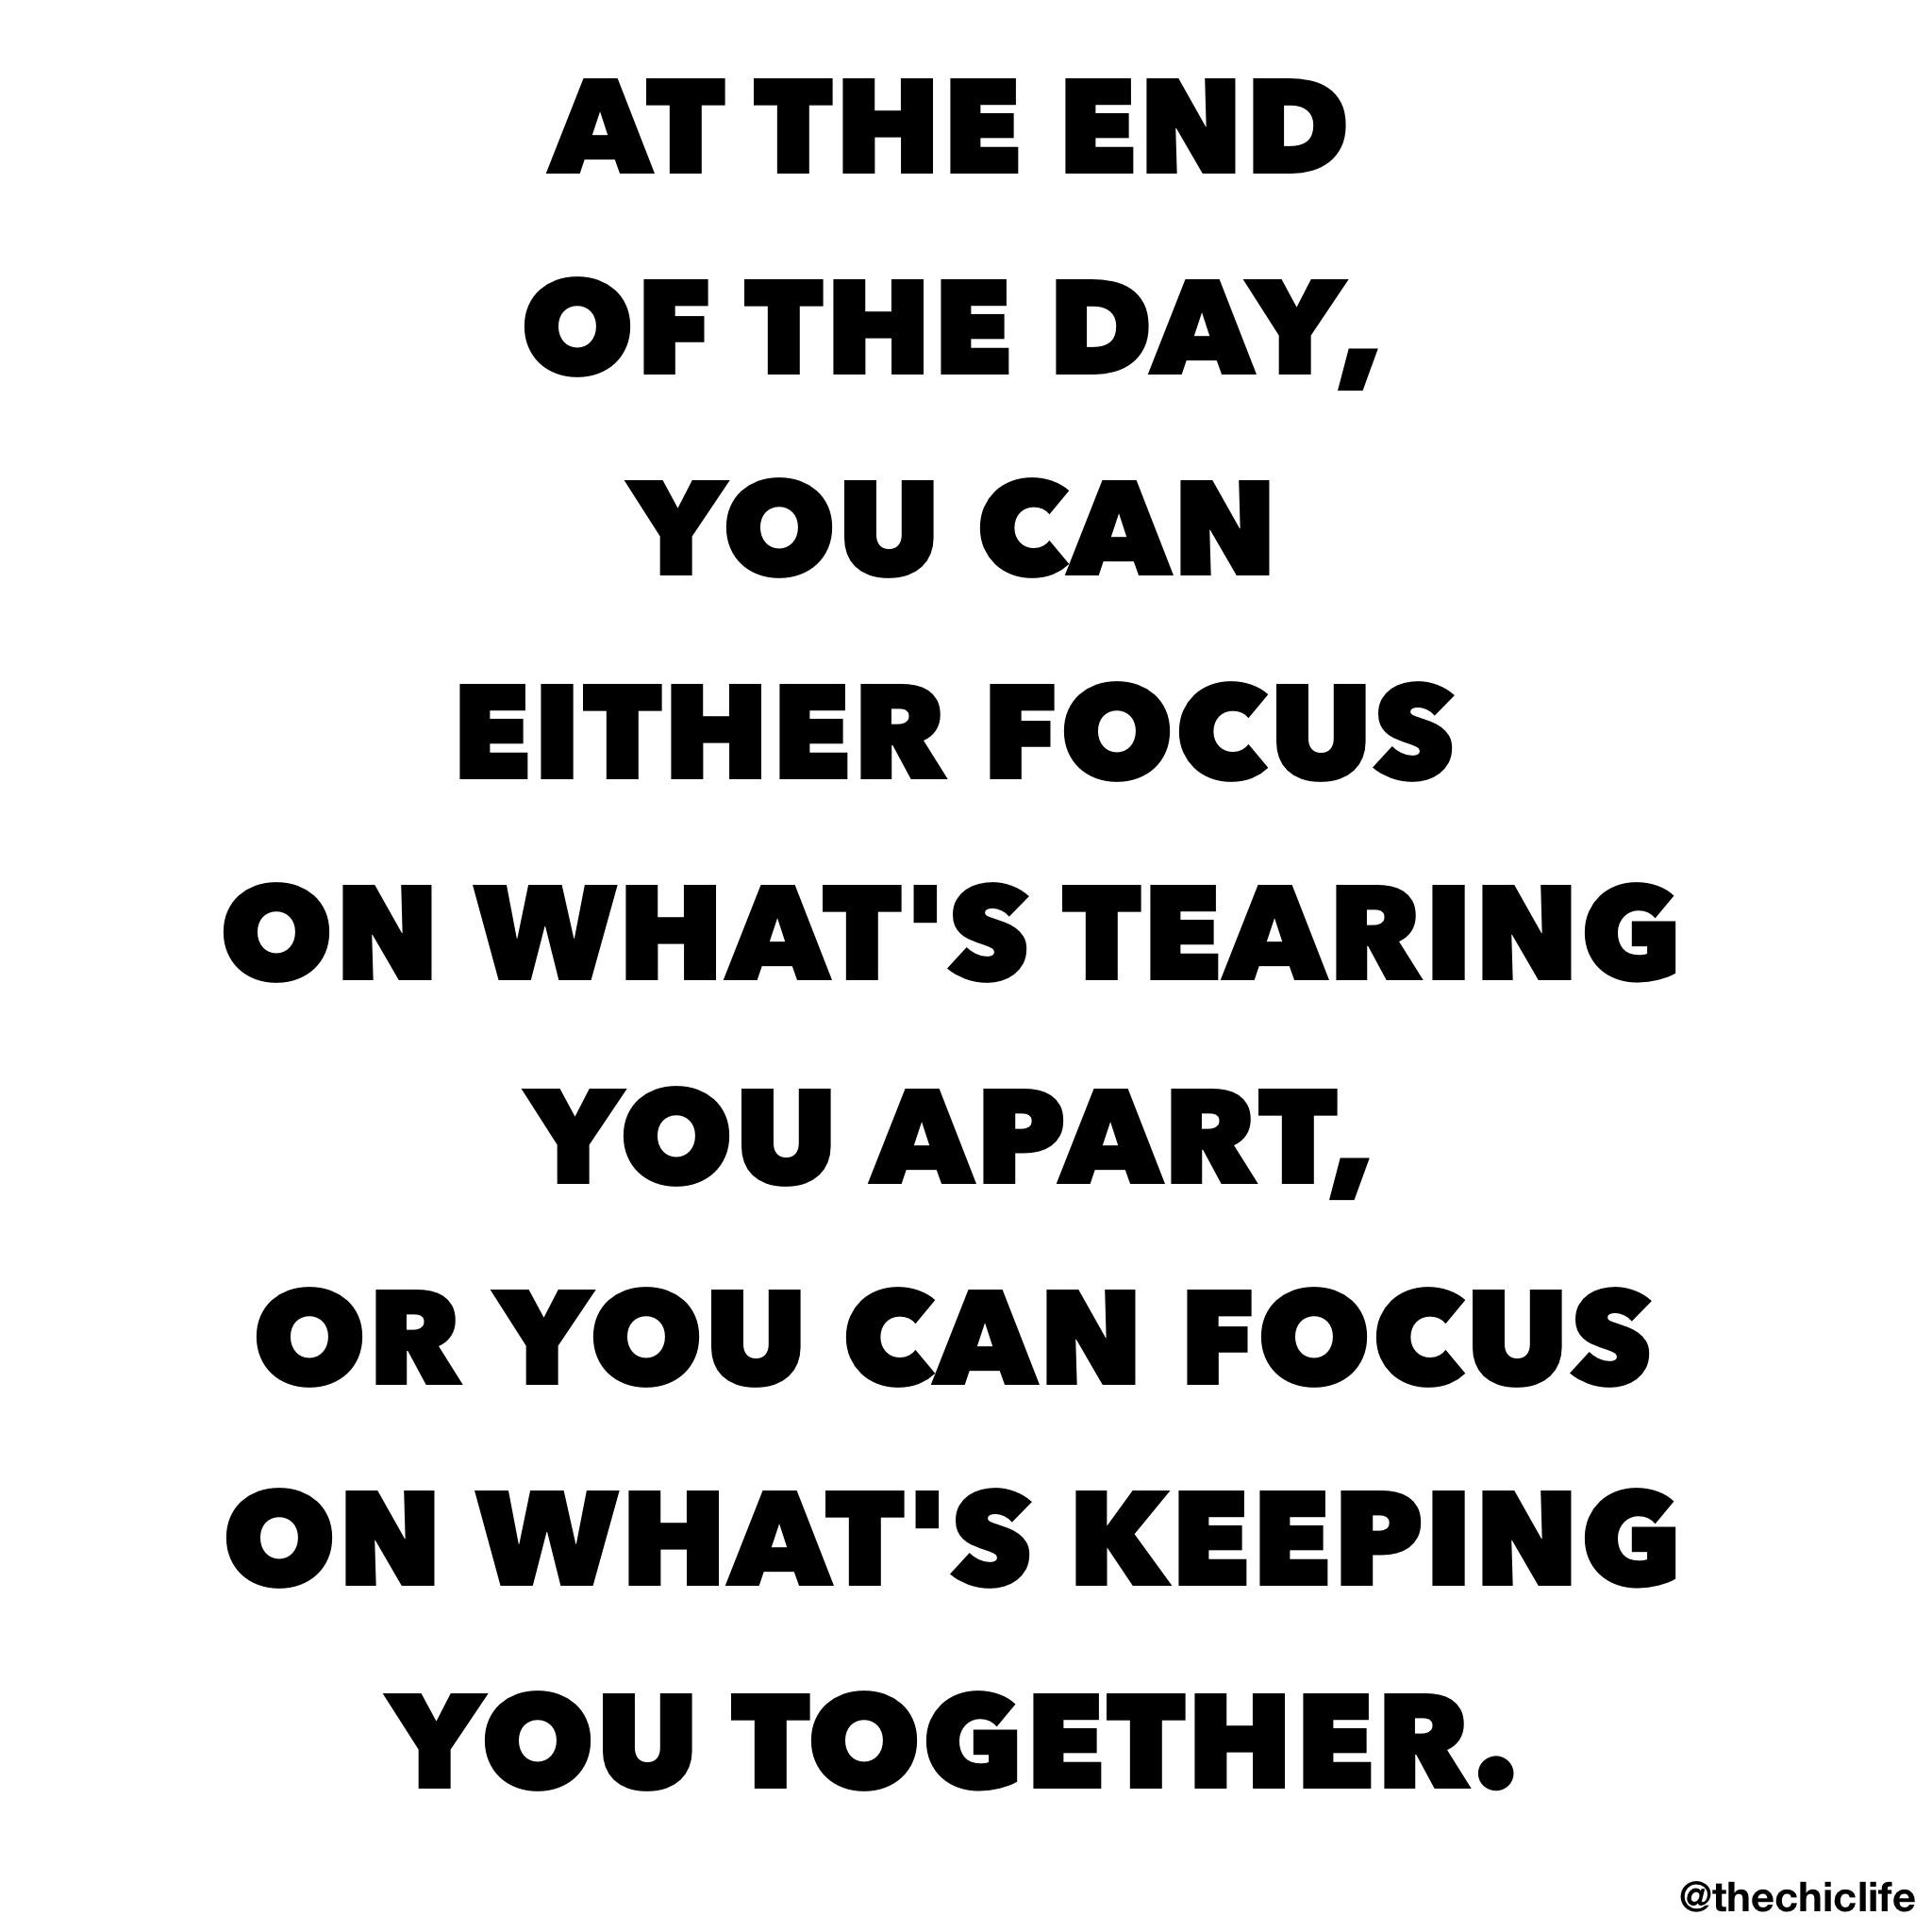 Choose Your Focus